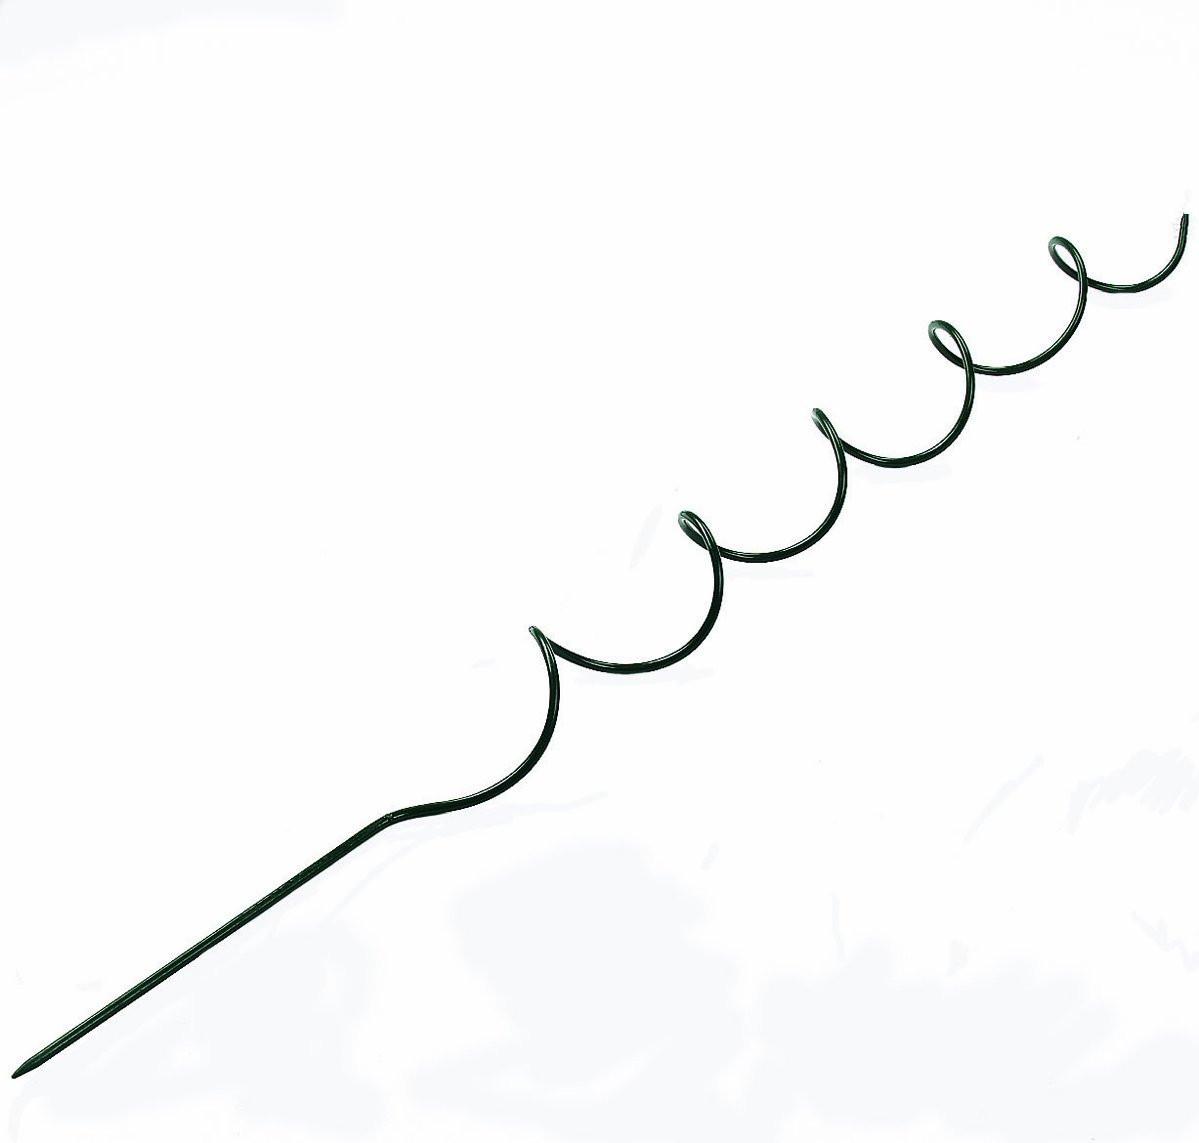 kroucená tyčka na rajčata 6 mm x 180 cm